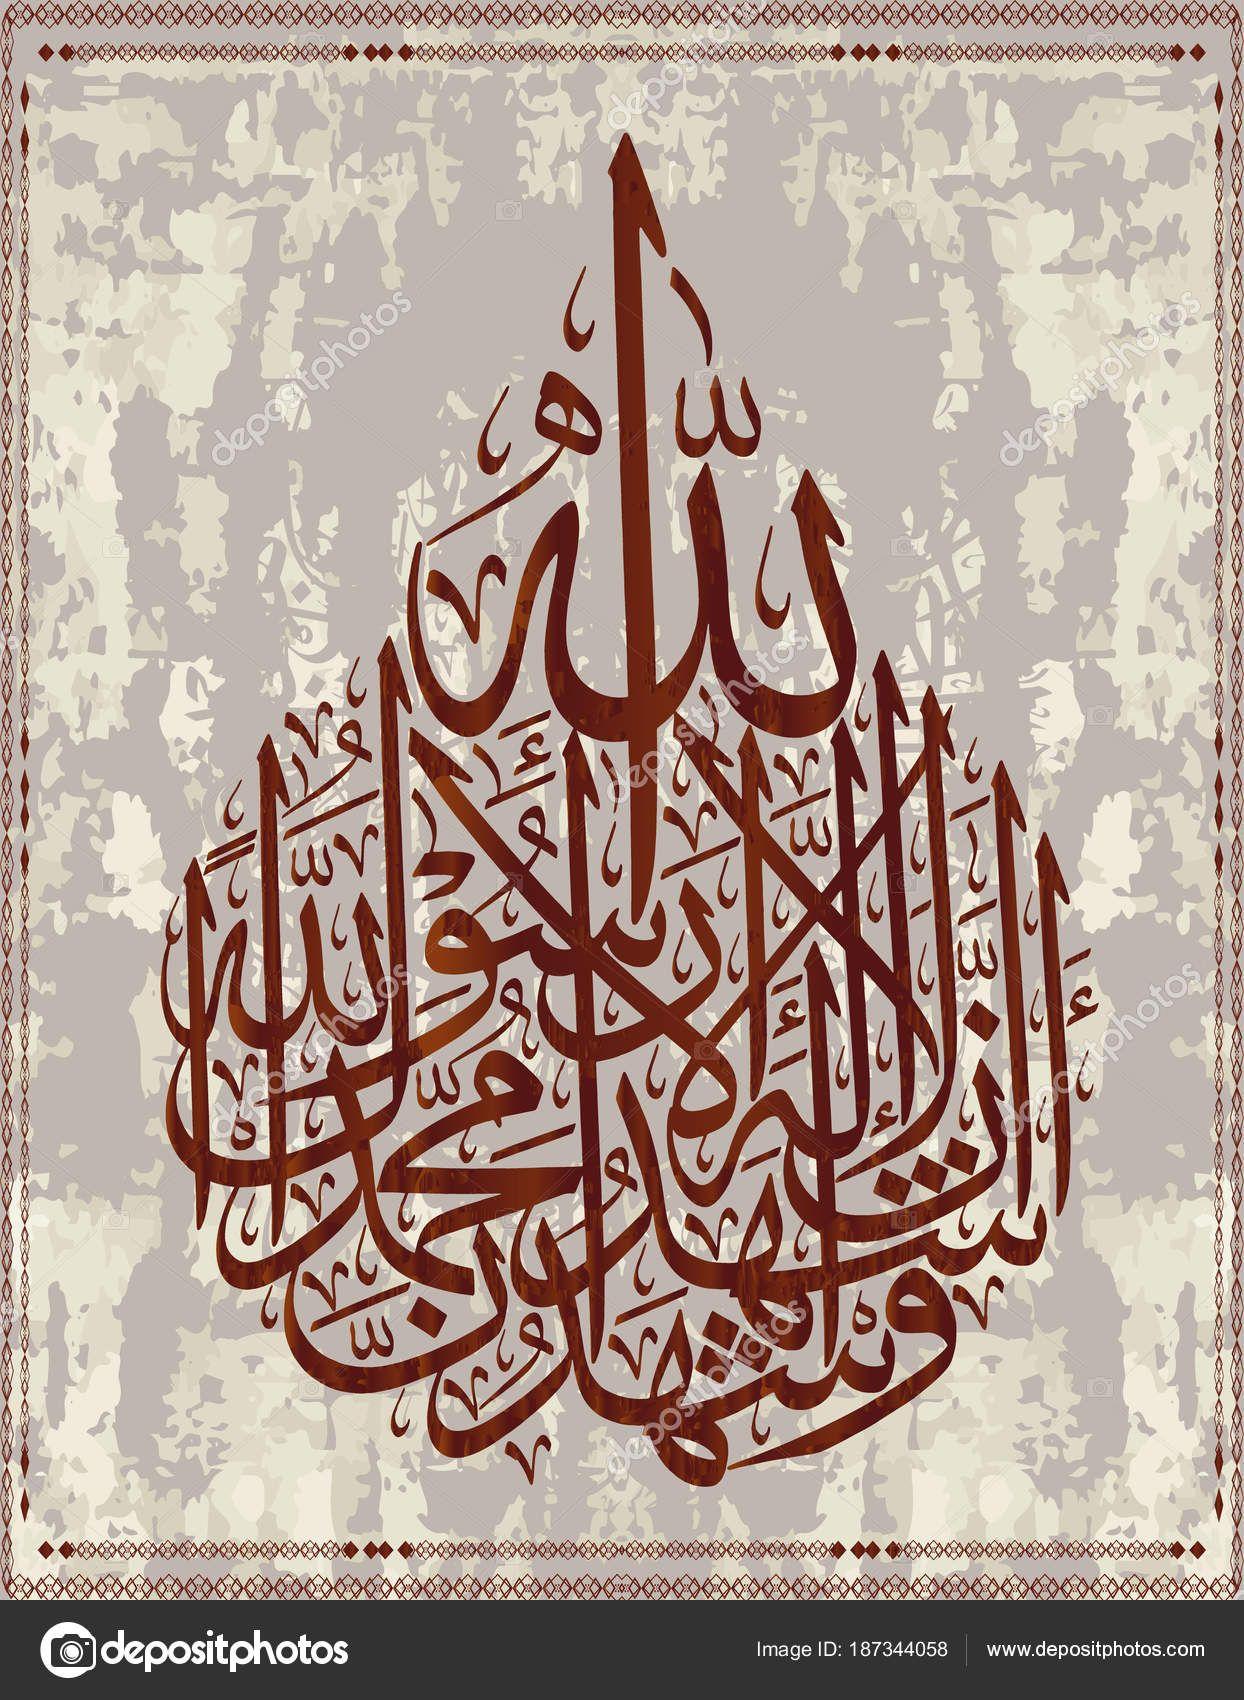 Image Result For La Ilaha Illallah Muhammadur Rasulullah Arabic Calligraphy Islamic Holidays Worship Stock Illustration